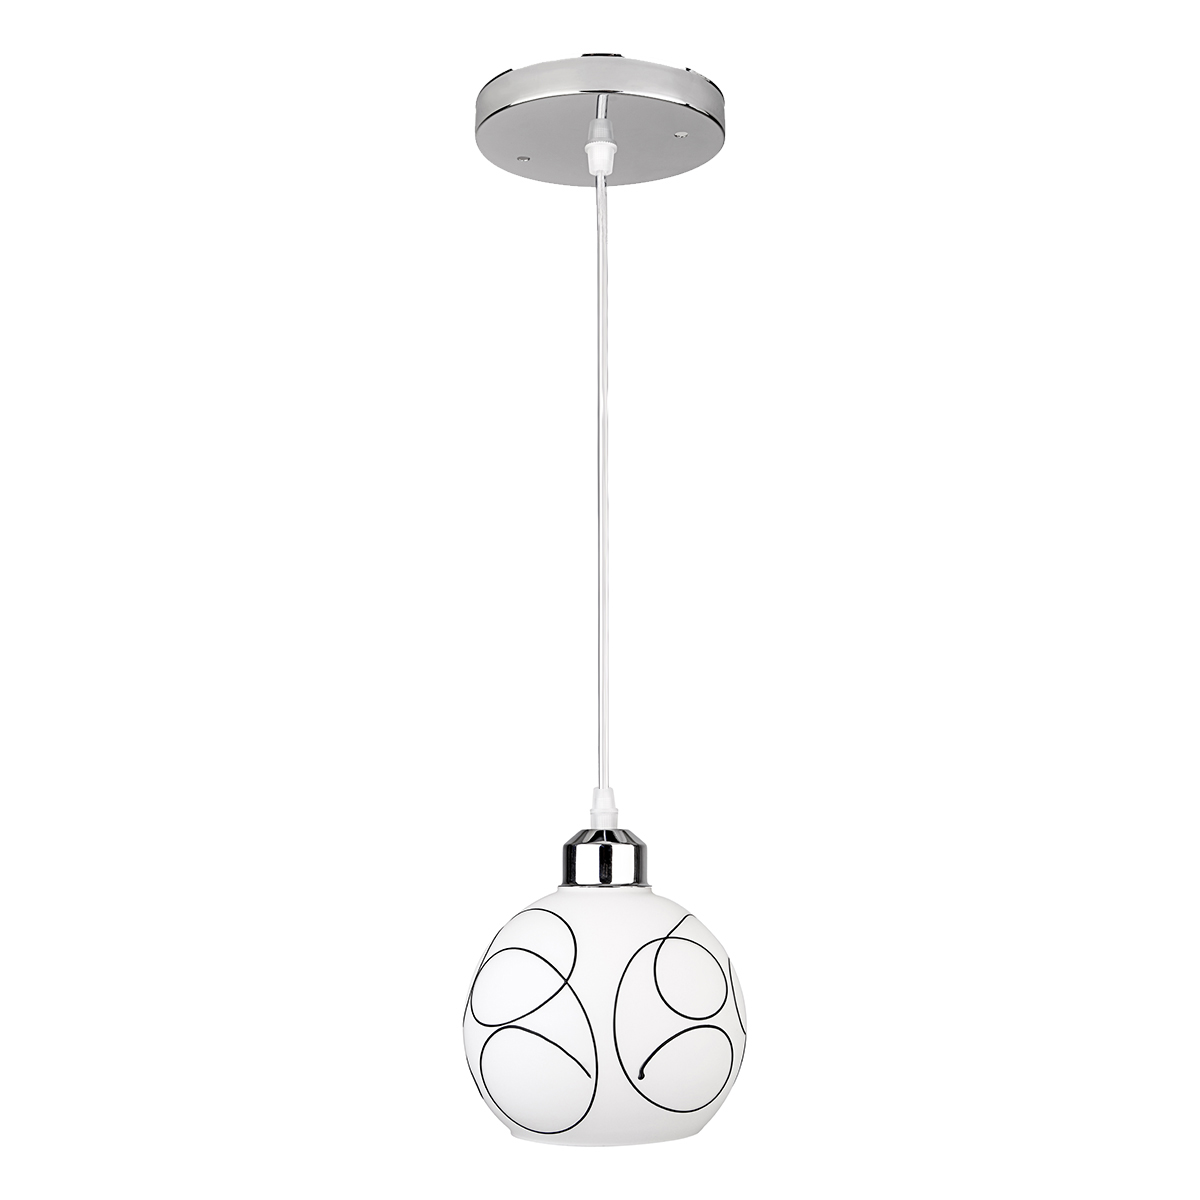 Modern Glass Iron Ceiling Light Lamp Chandelier Coffee Bar Decoration Fixture Home Hotel Indoor Lighting E27 Holder